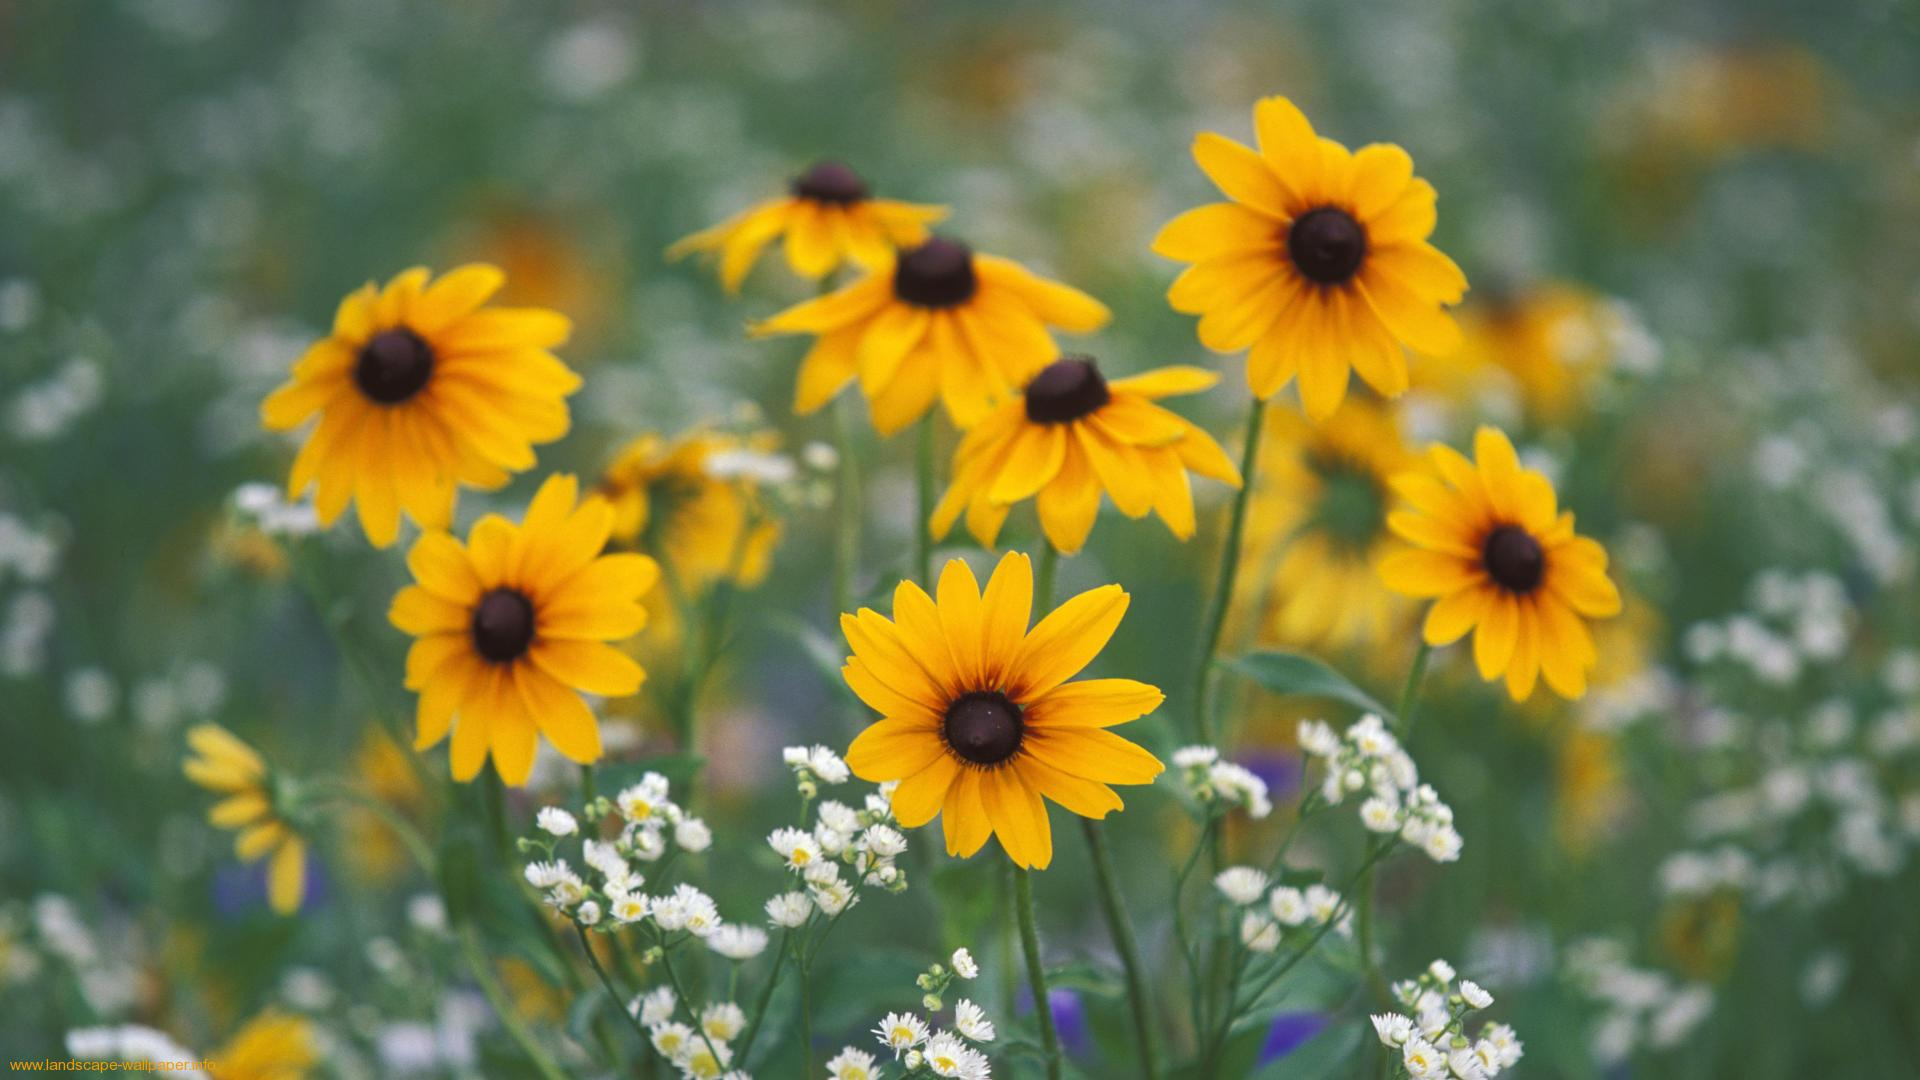 widescreen wild flowers, by krastyu craufurd, Beautiful flower